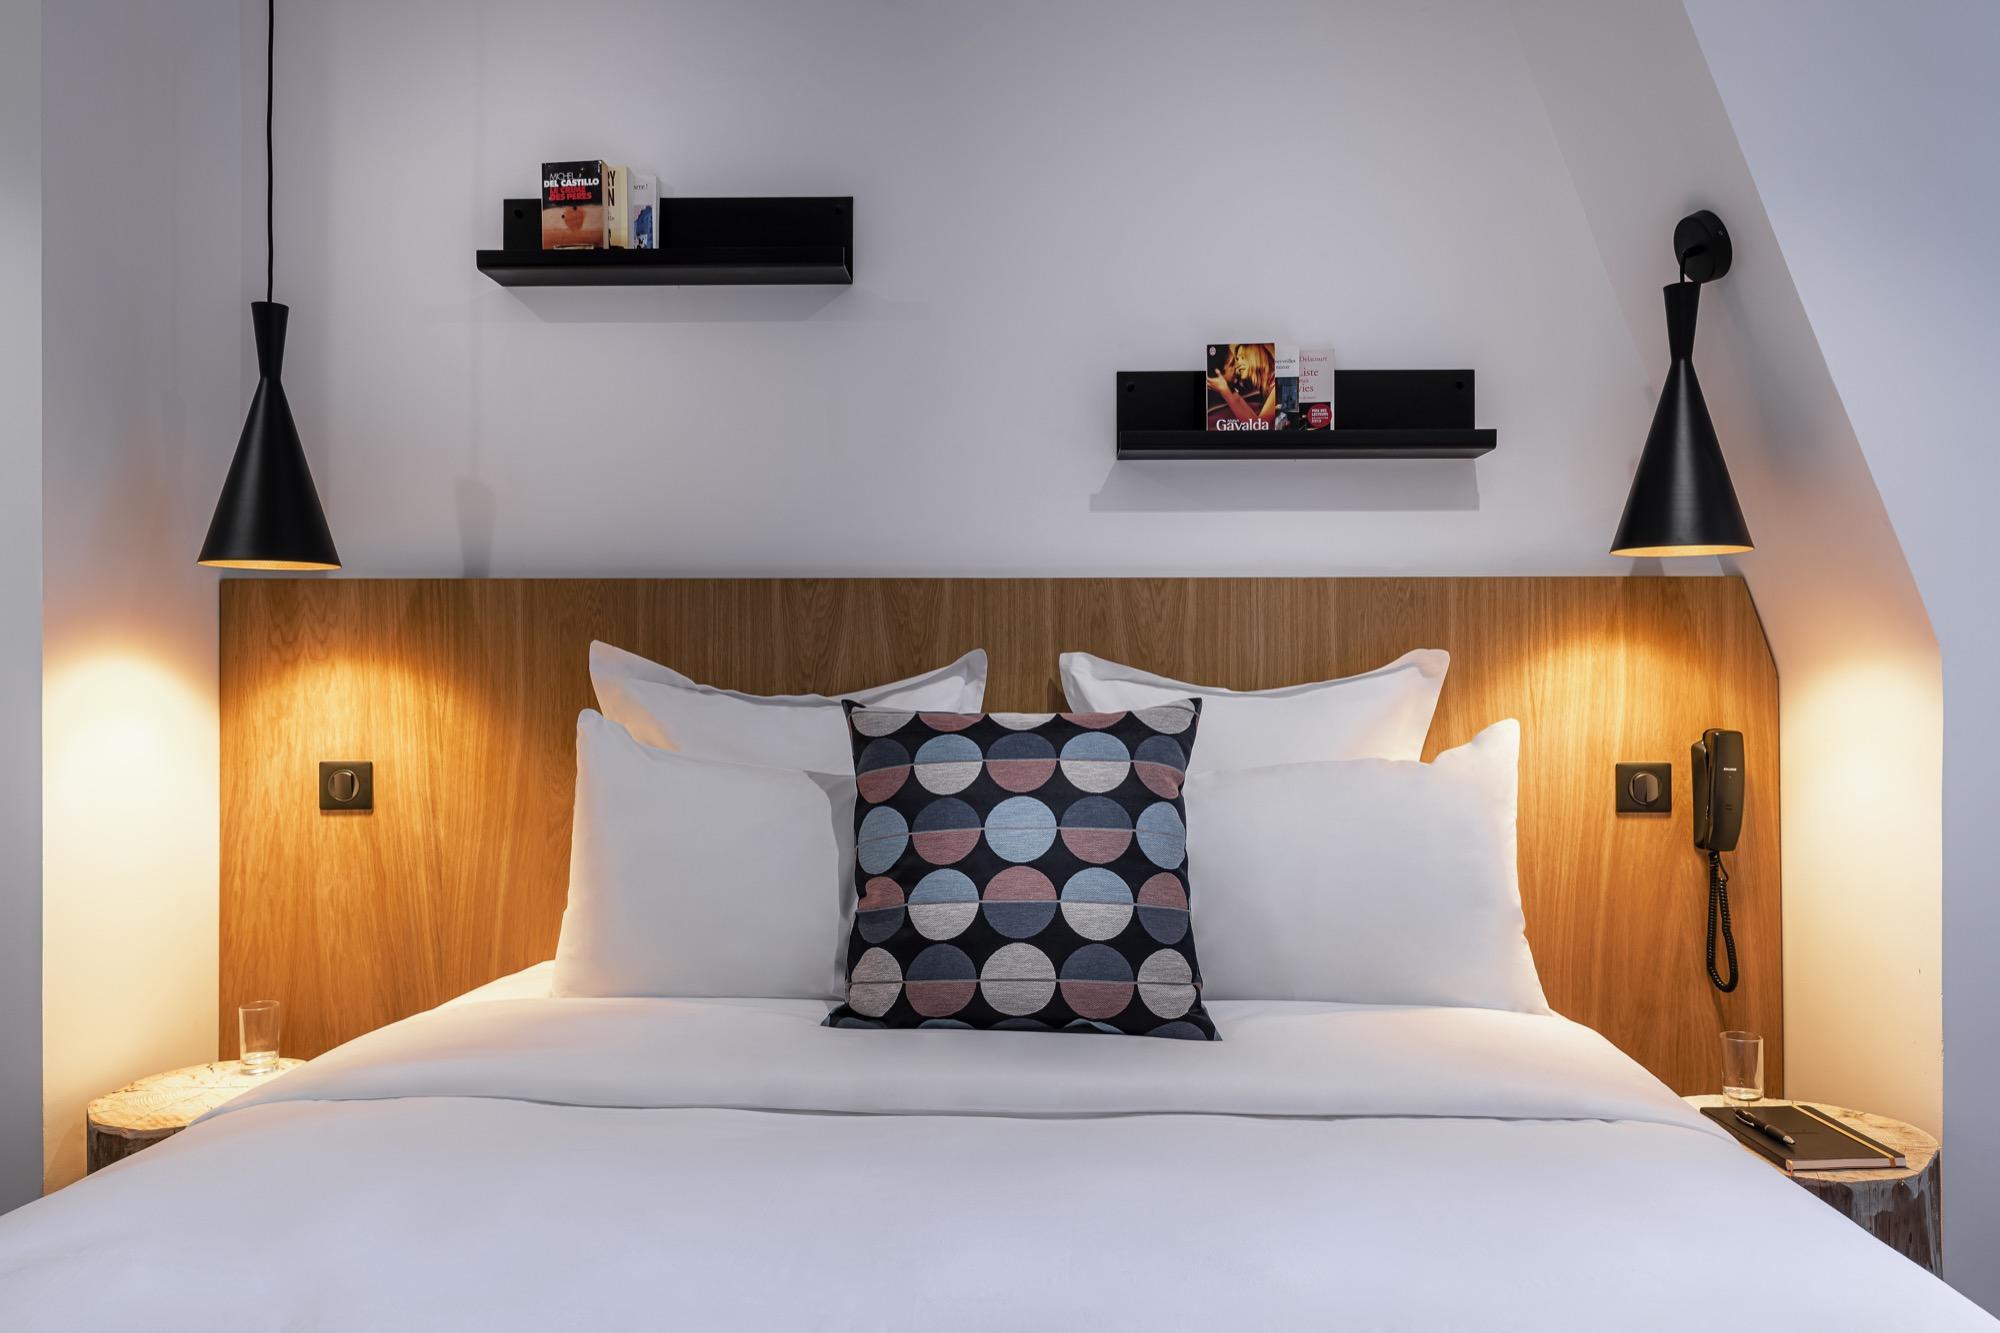 club room 9 hotel Bastille-Lyon Paris 12